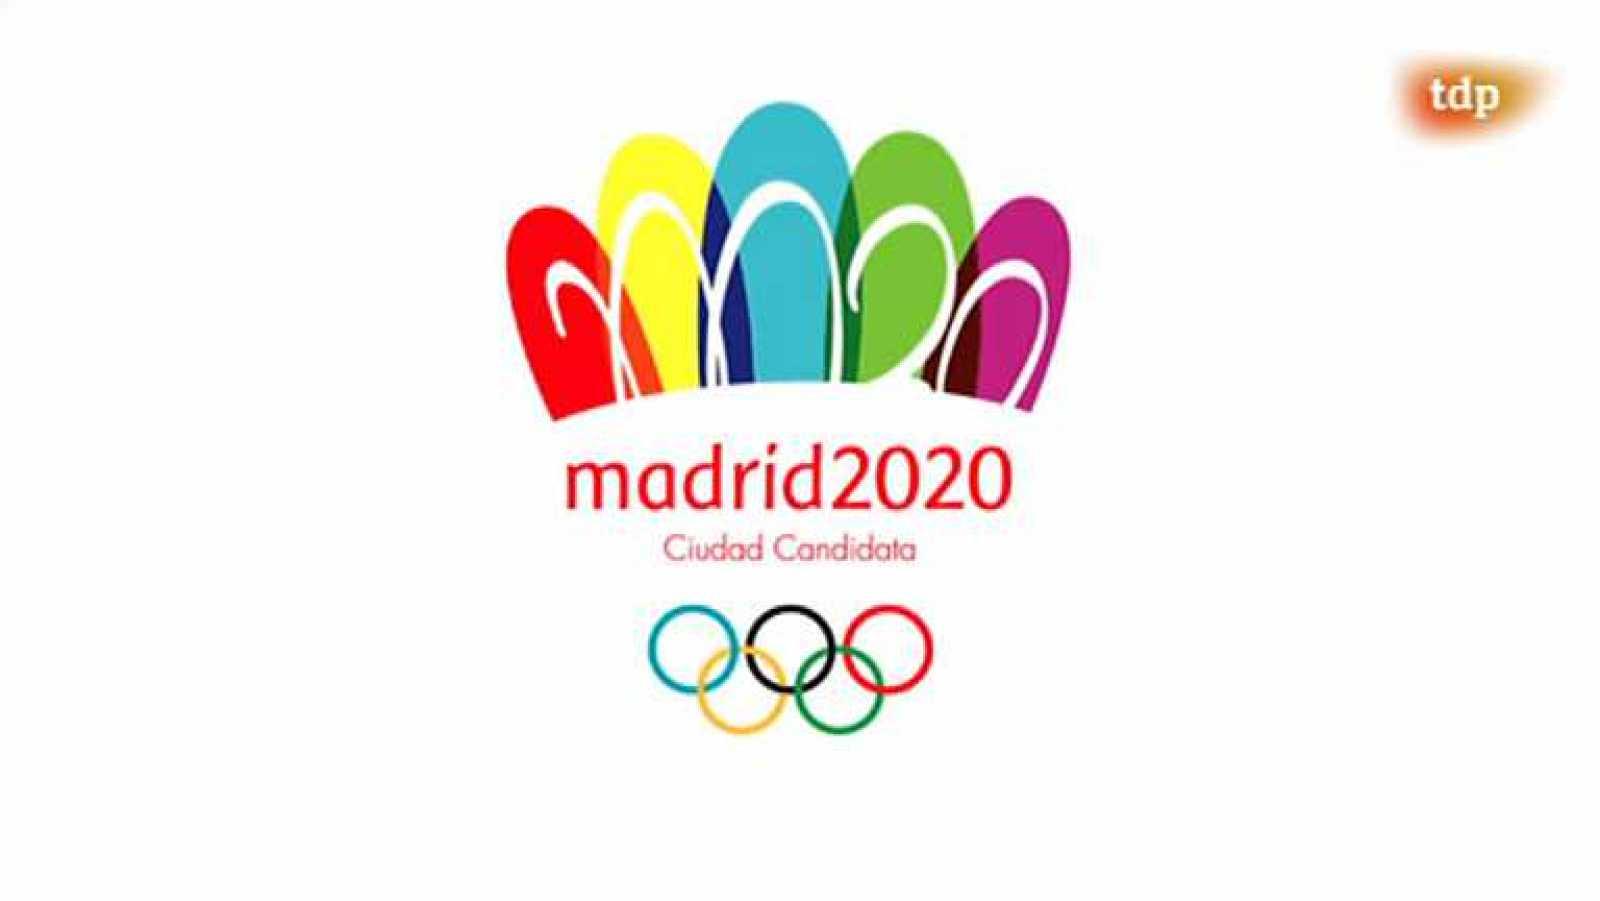 Madrid 2020 - 06/09/13 - Ver ahora